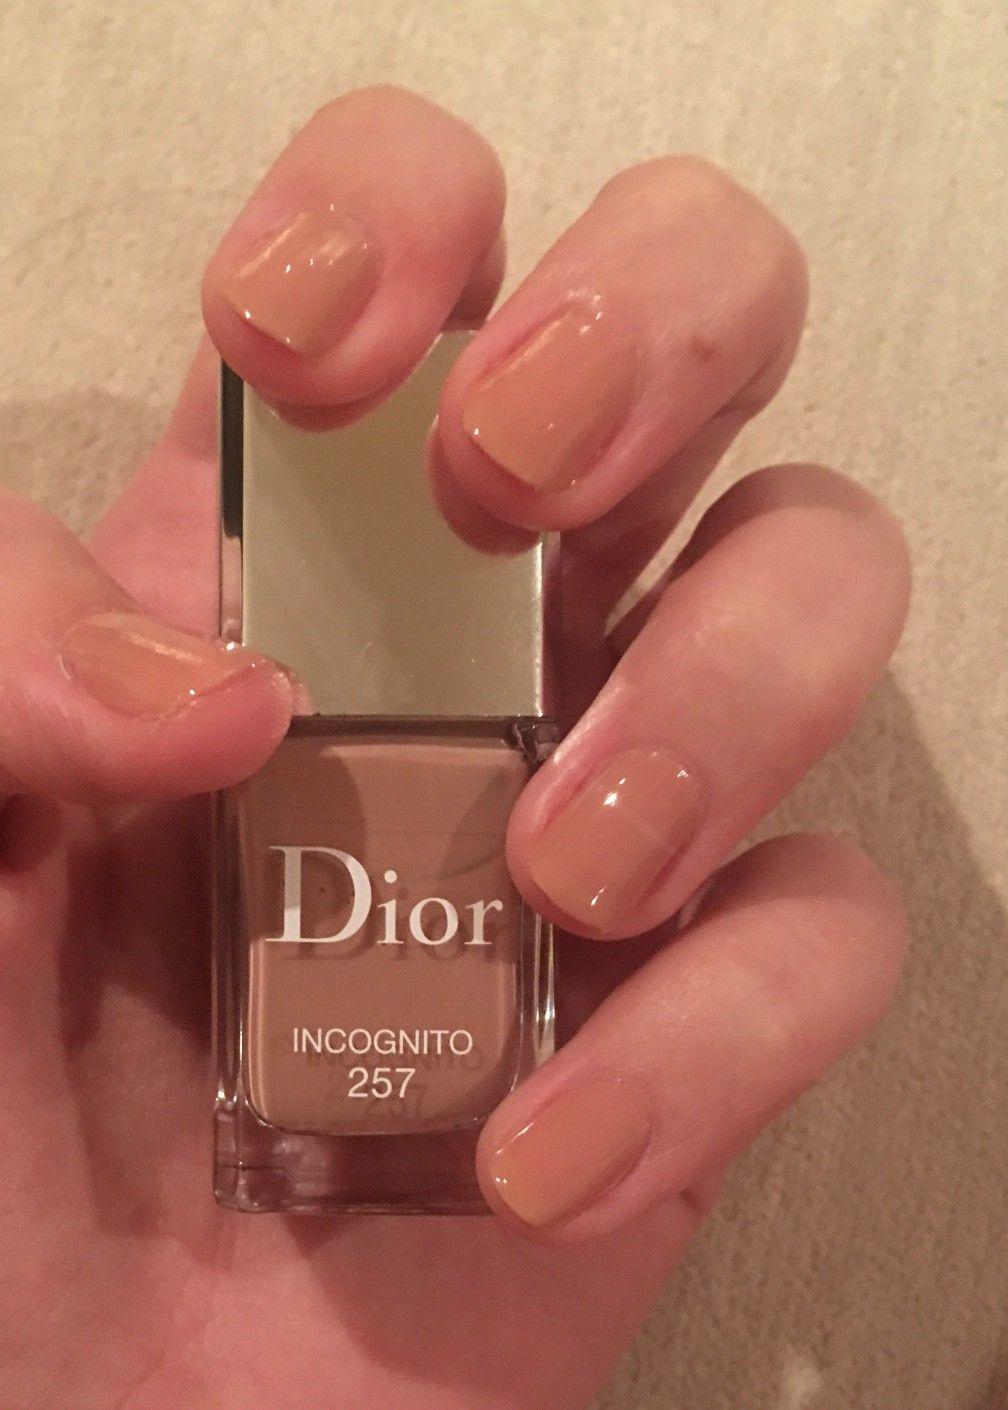 Dior Vernis Gel Lacquer 257 Incognito Nail Polish Polish